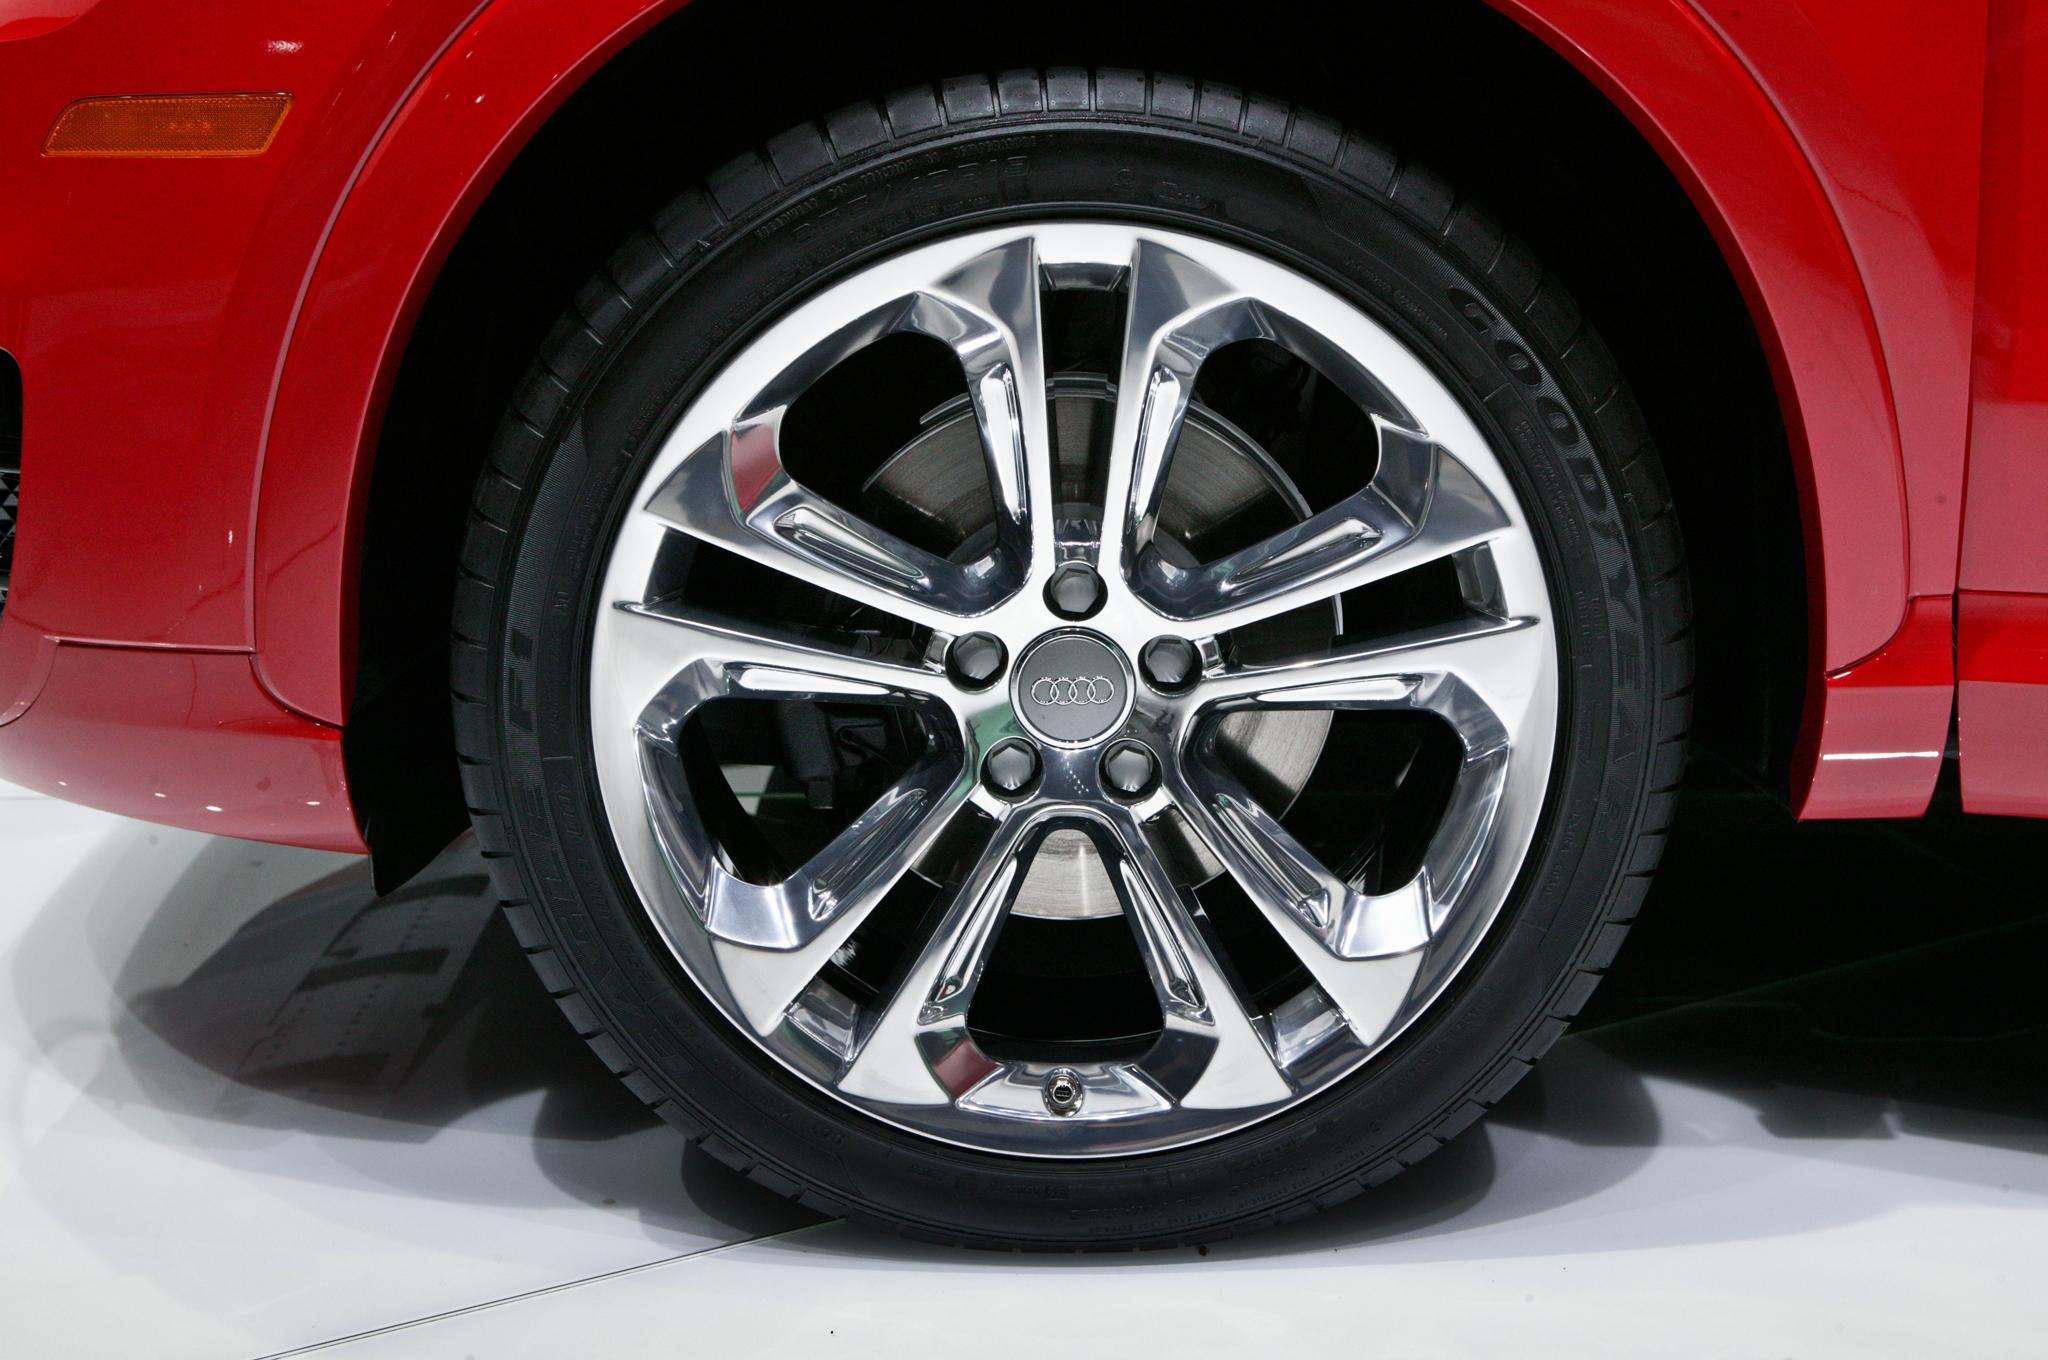 2015 Audi Q3 Front Wheel